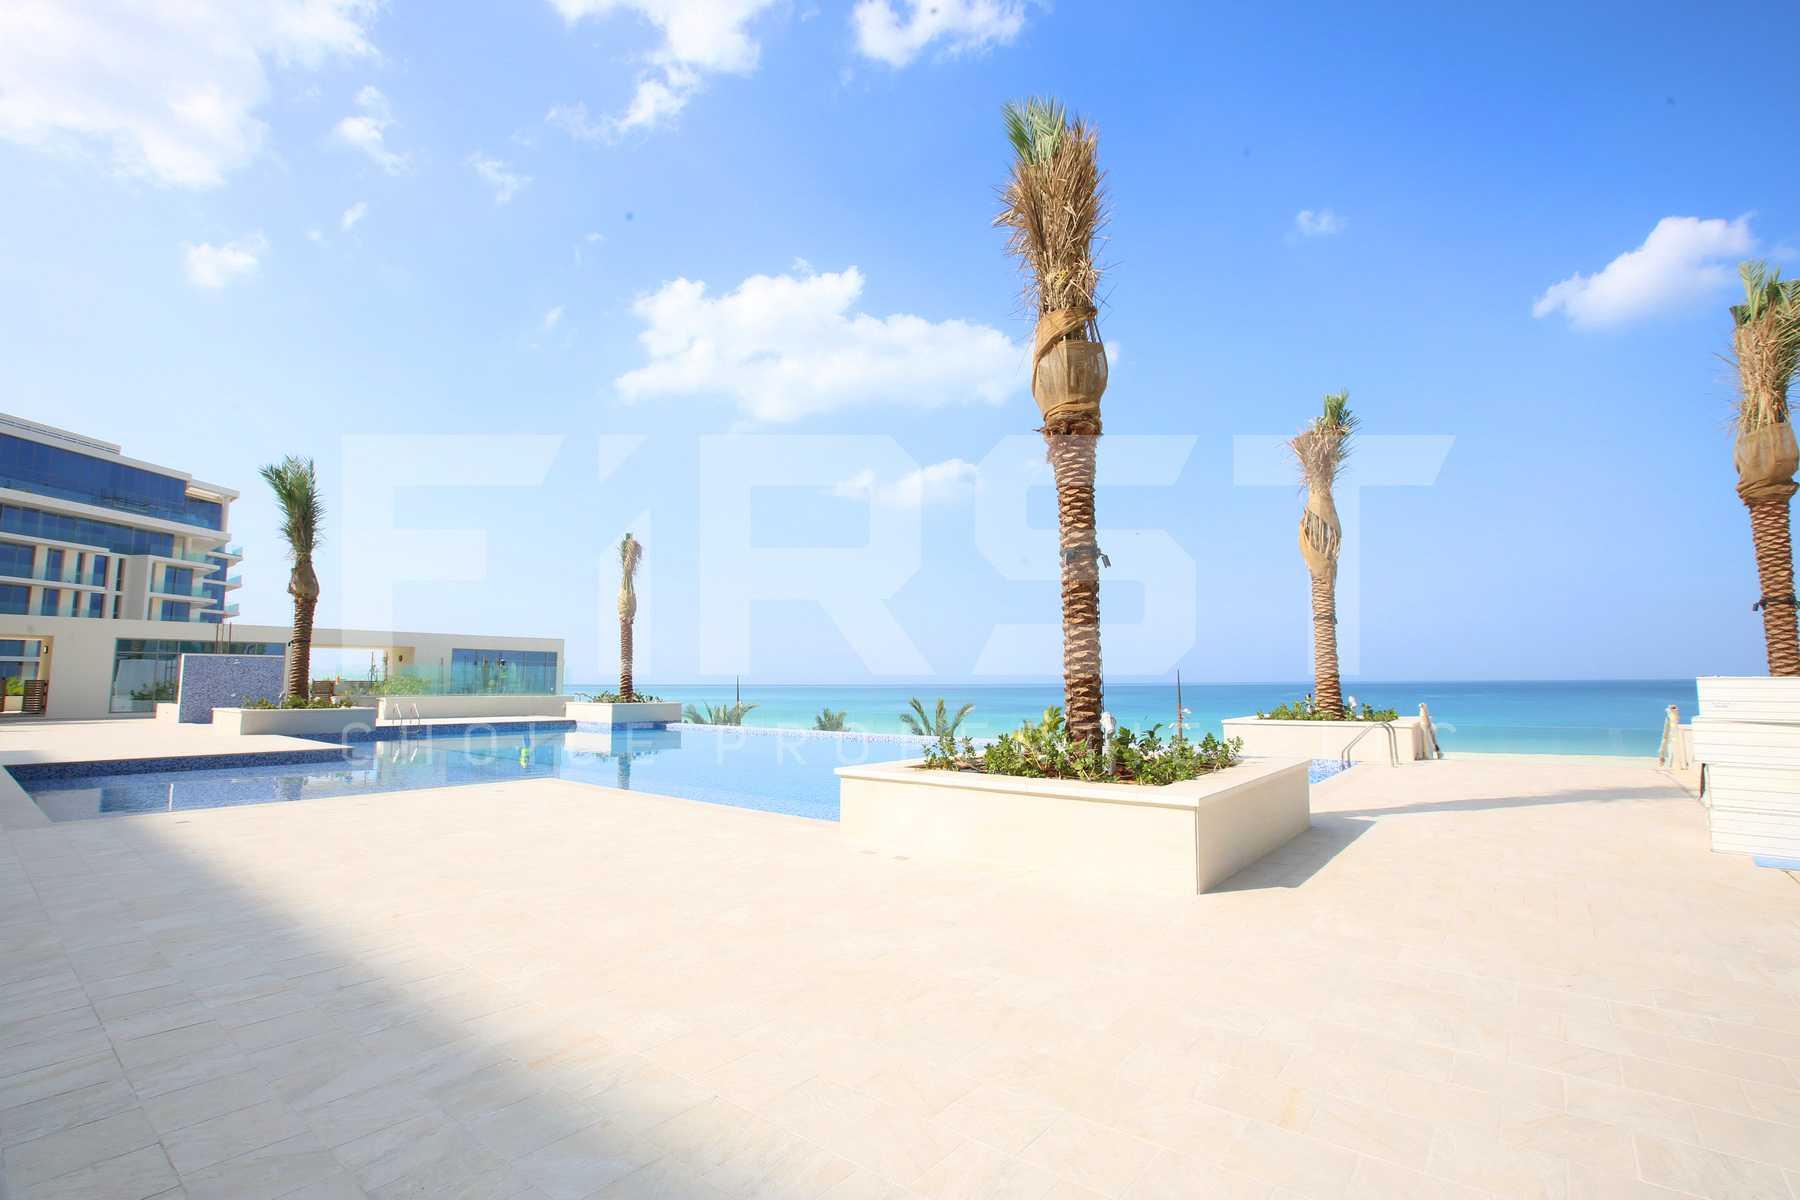 External Photo of Mamsha Al Saadiyat Island UAE (1).jpg